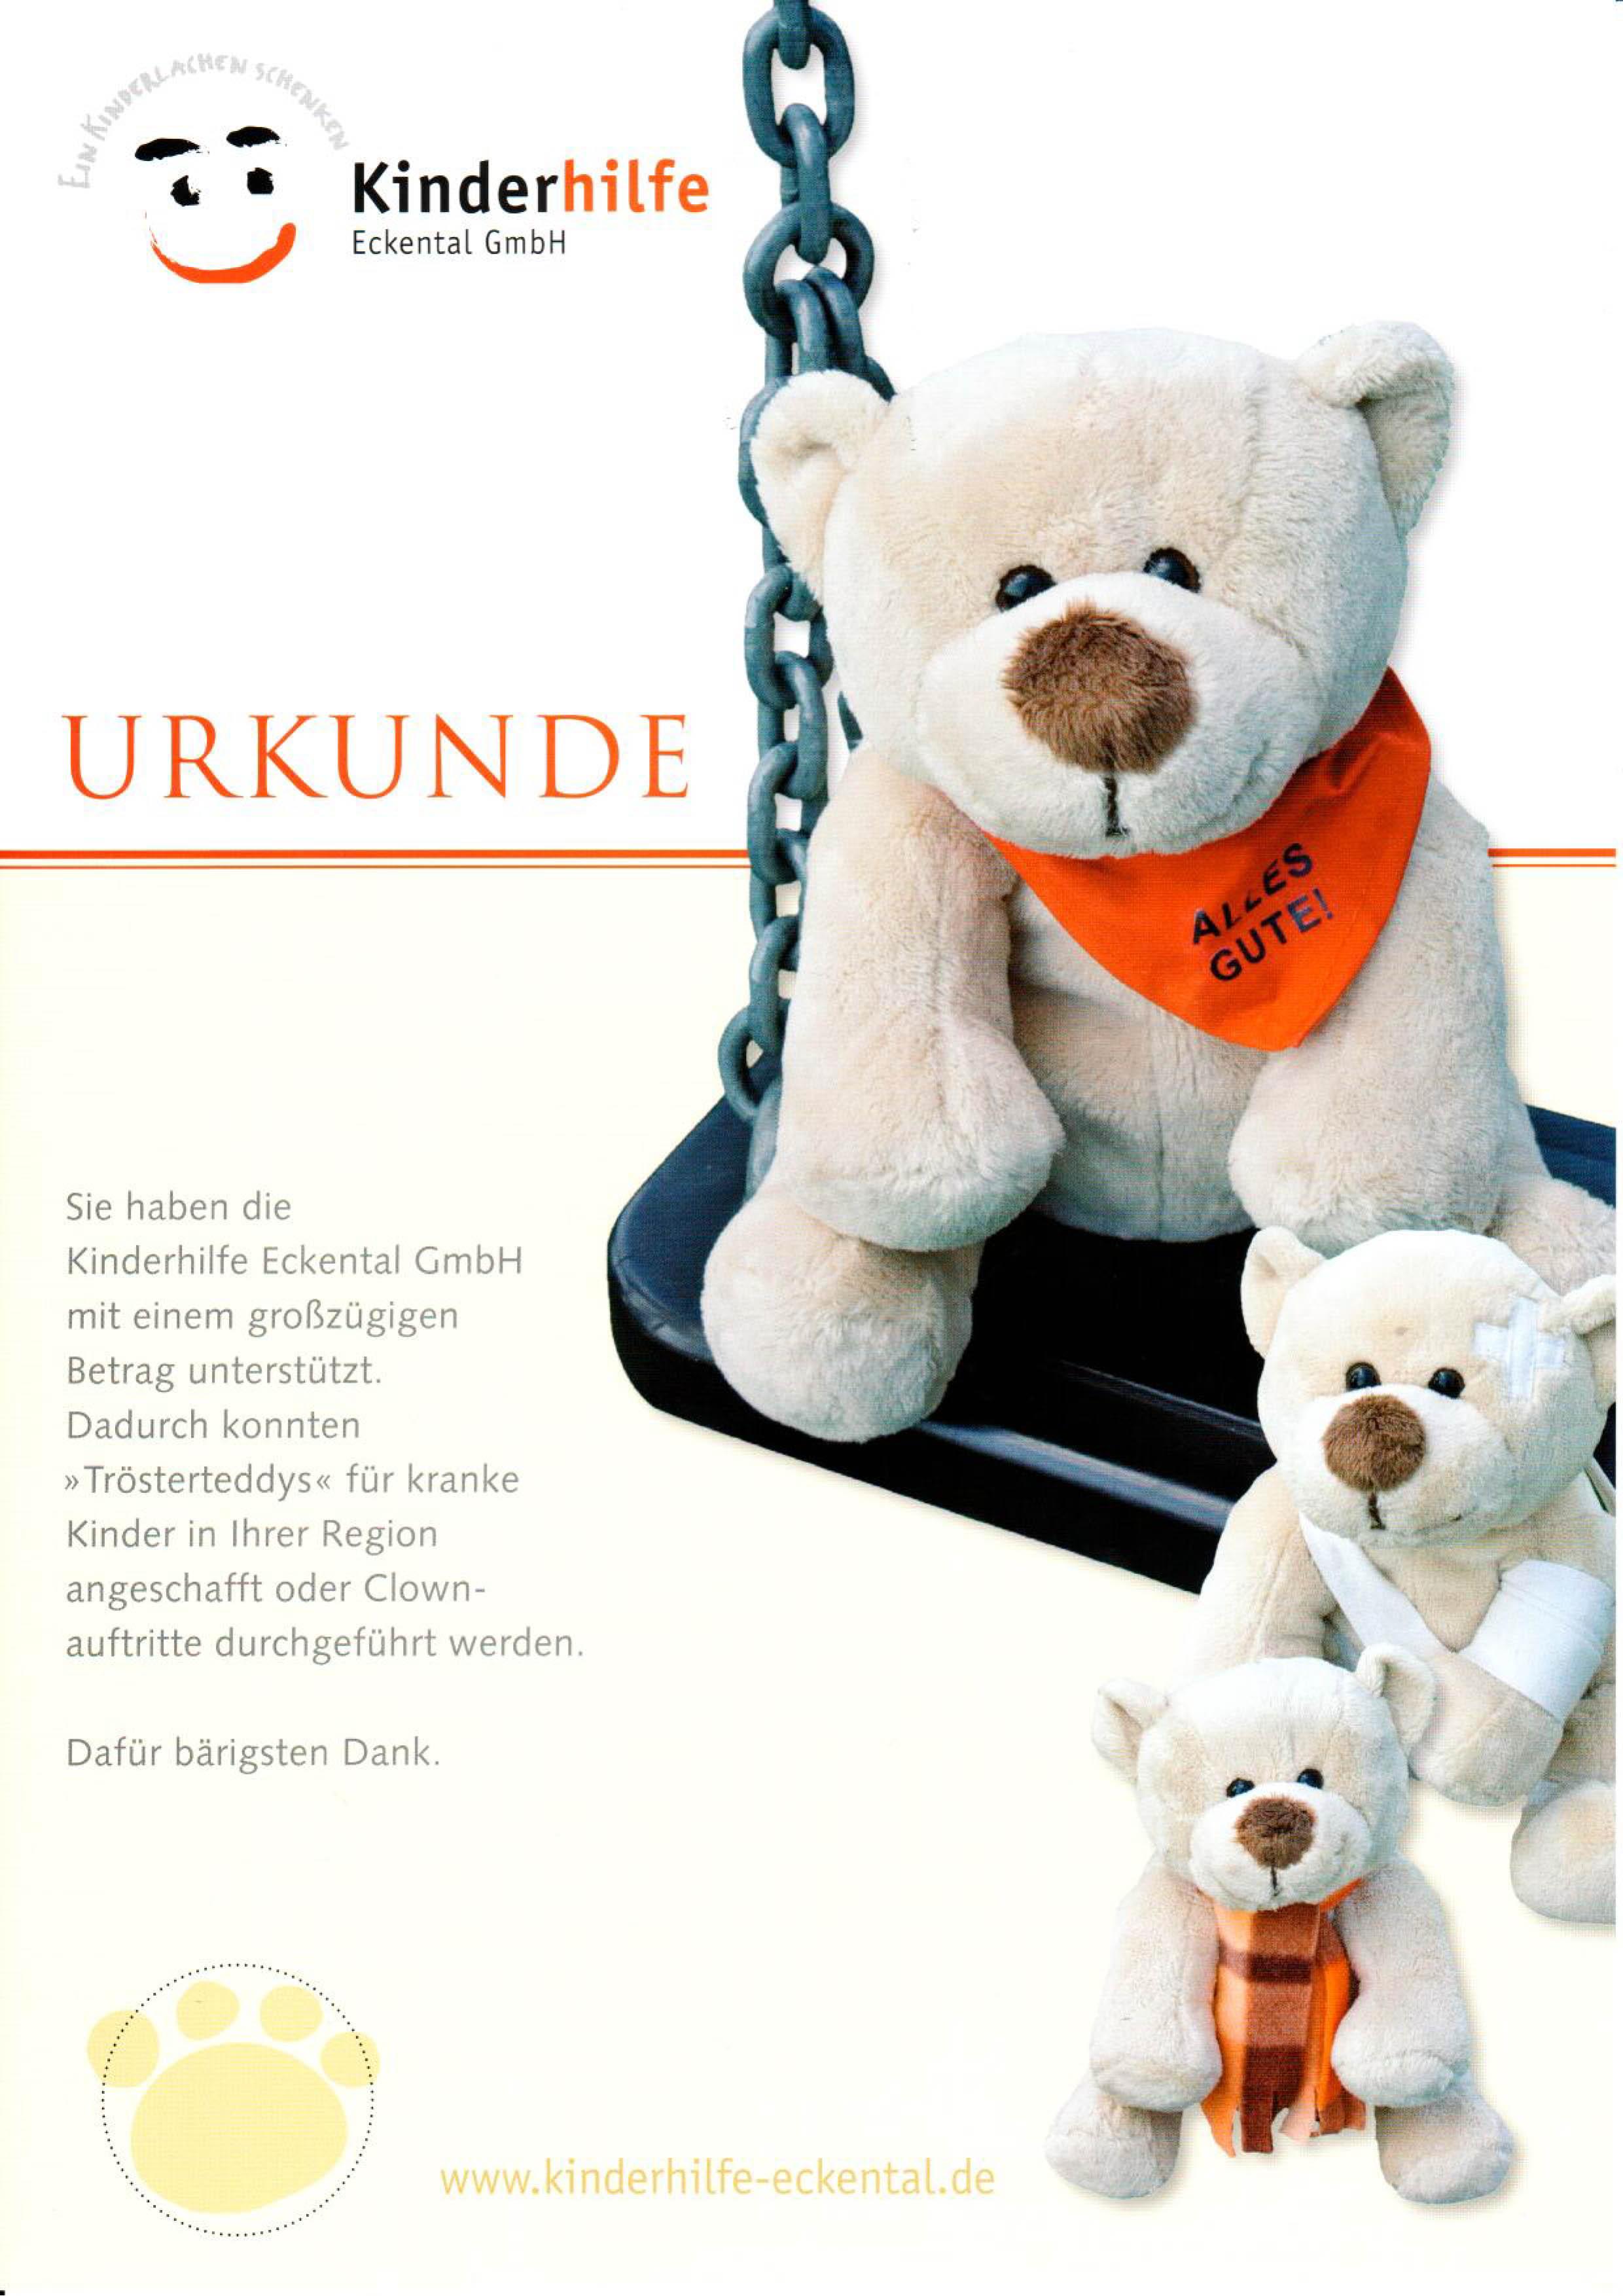 Urkunde Kinderhilfe Eckental GmbH, Trösterteddy